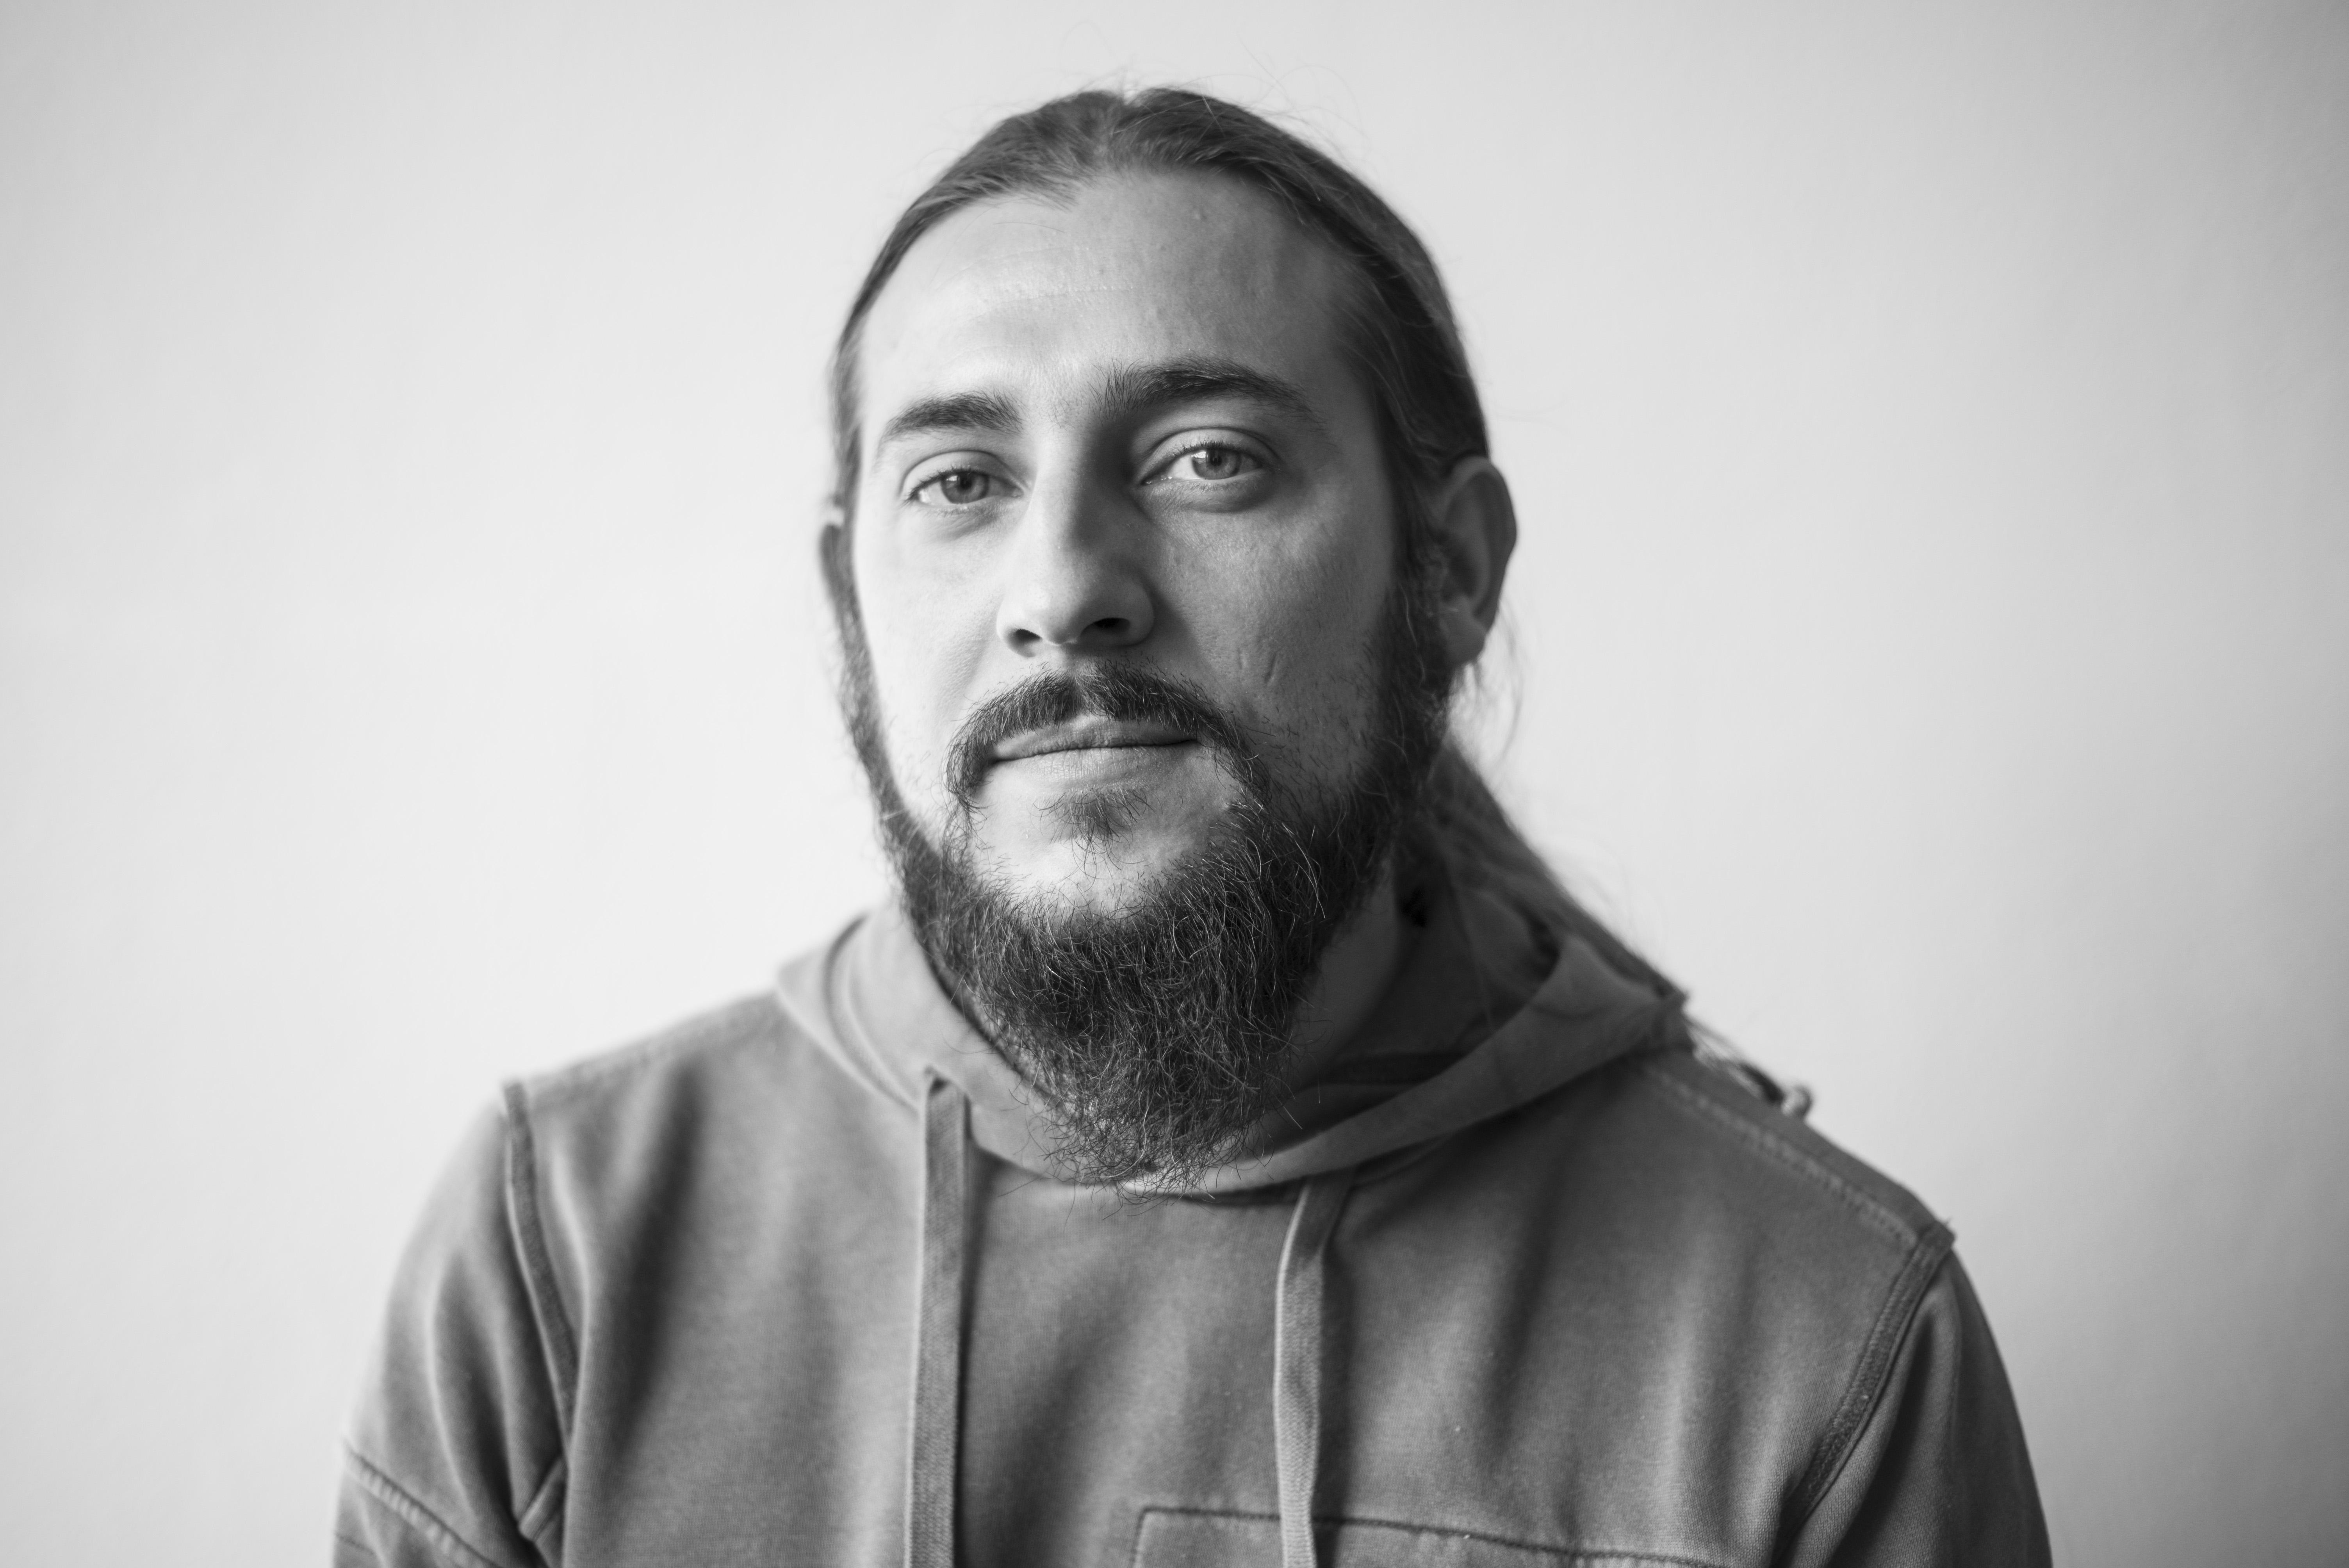 Alessandro Raminelli